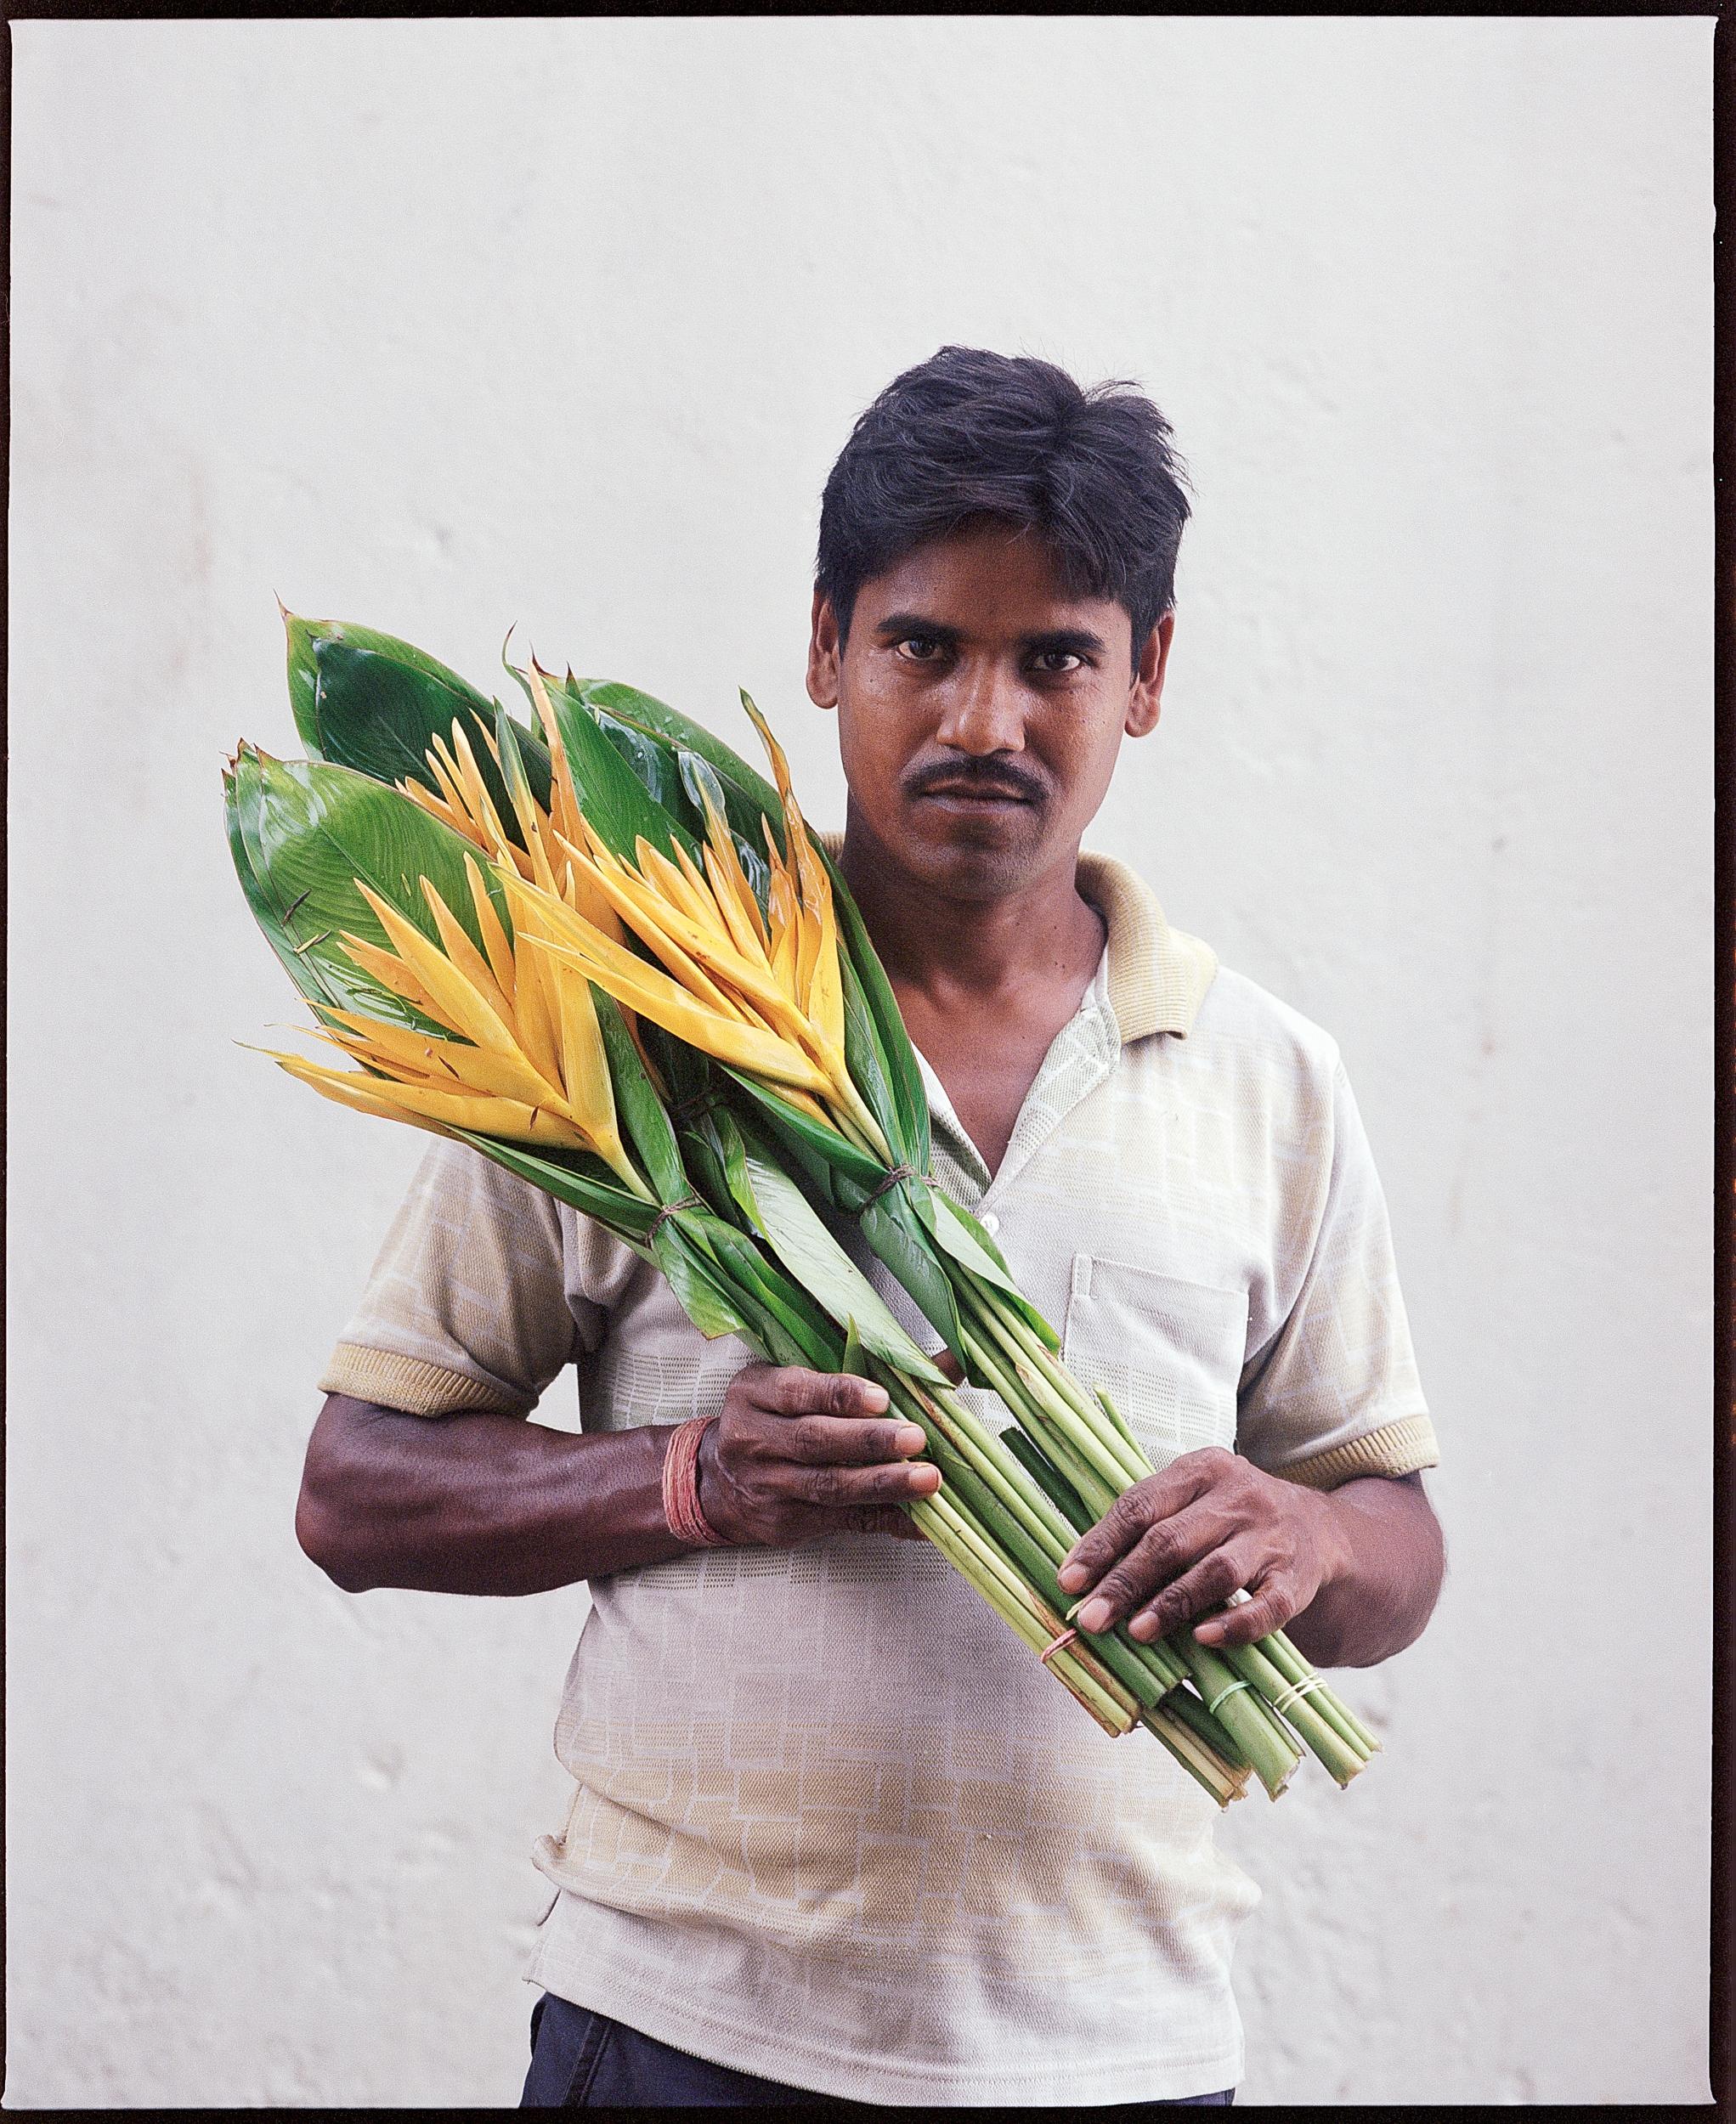 Kolkata_Flowers-4.jpg